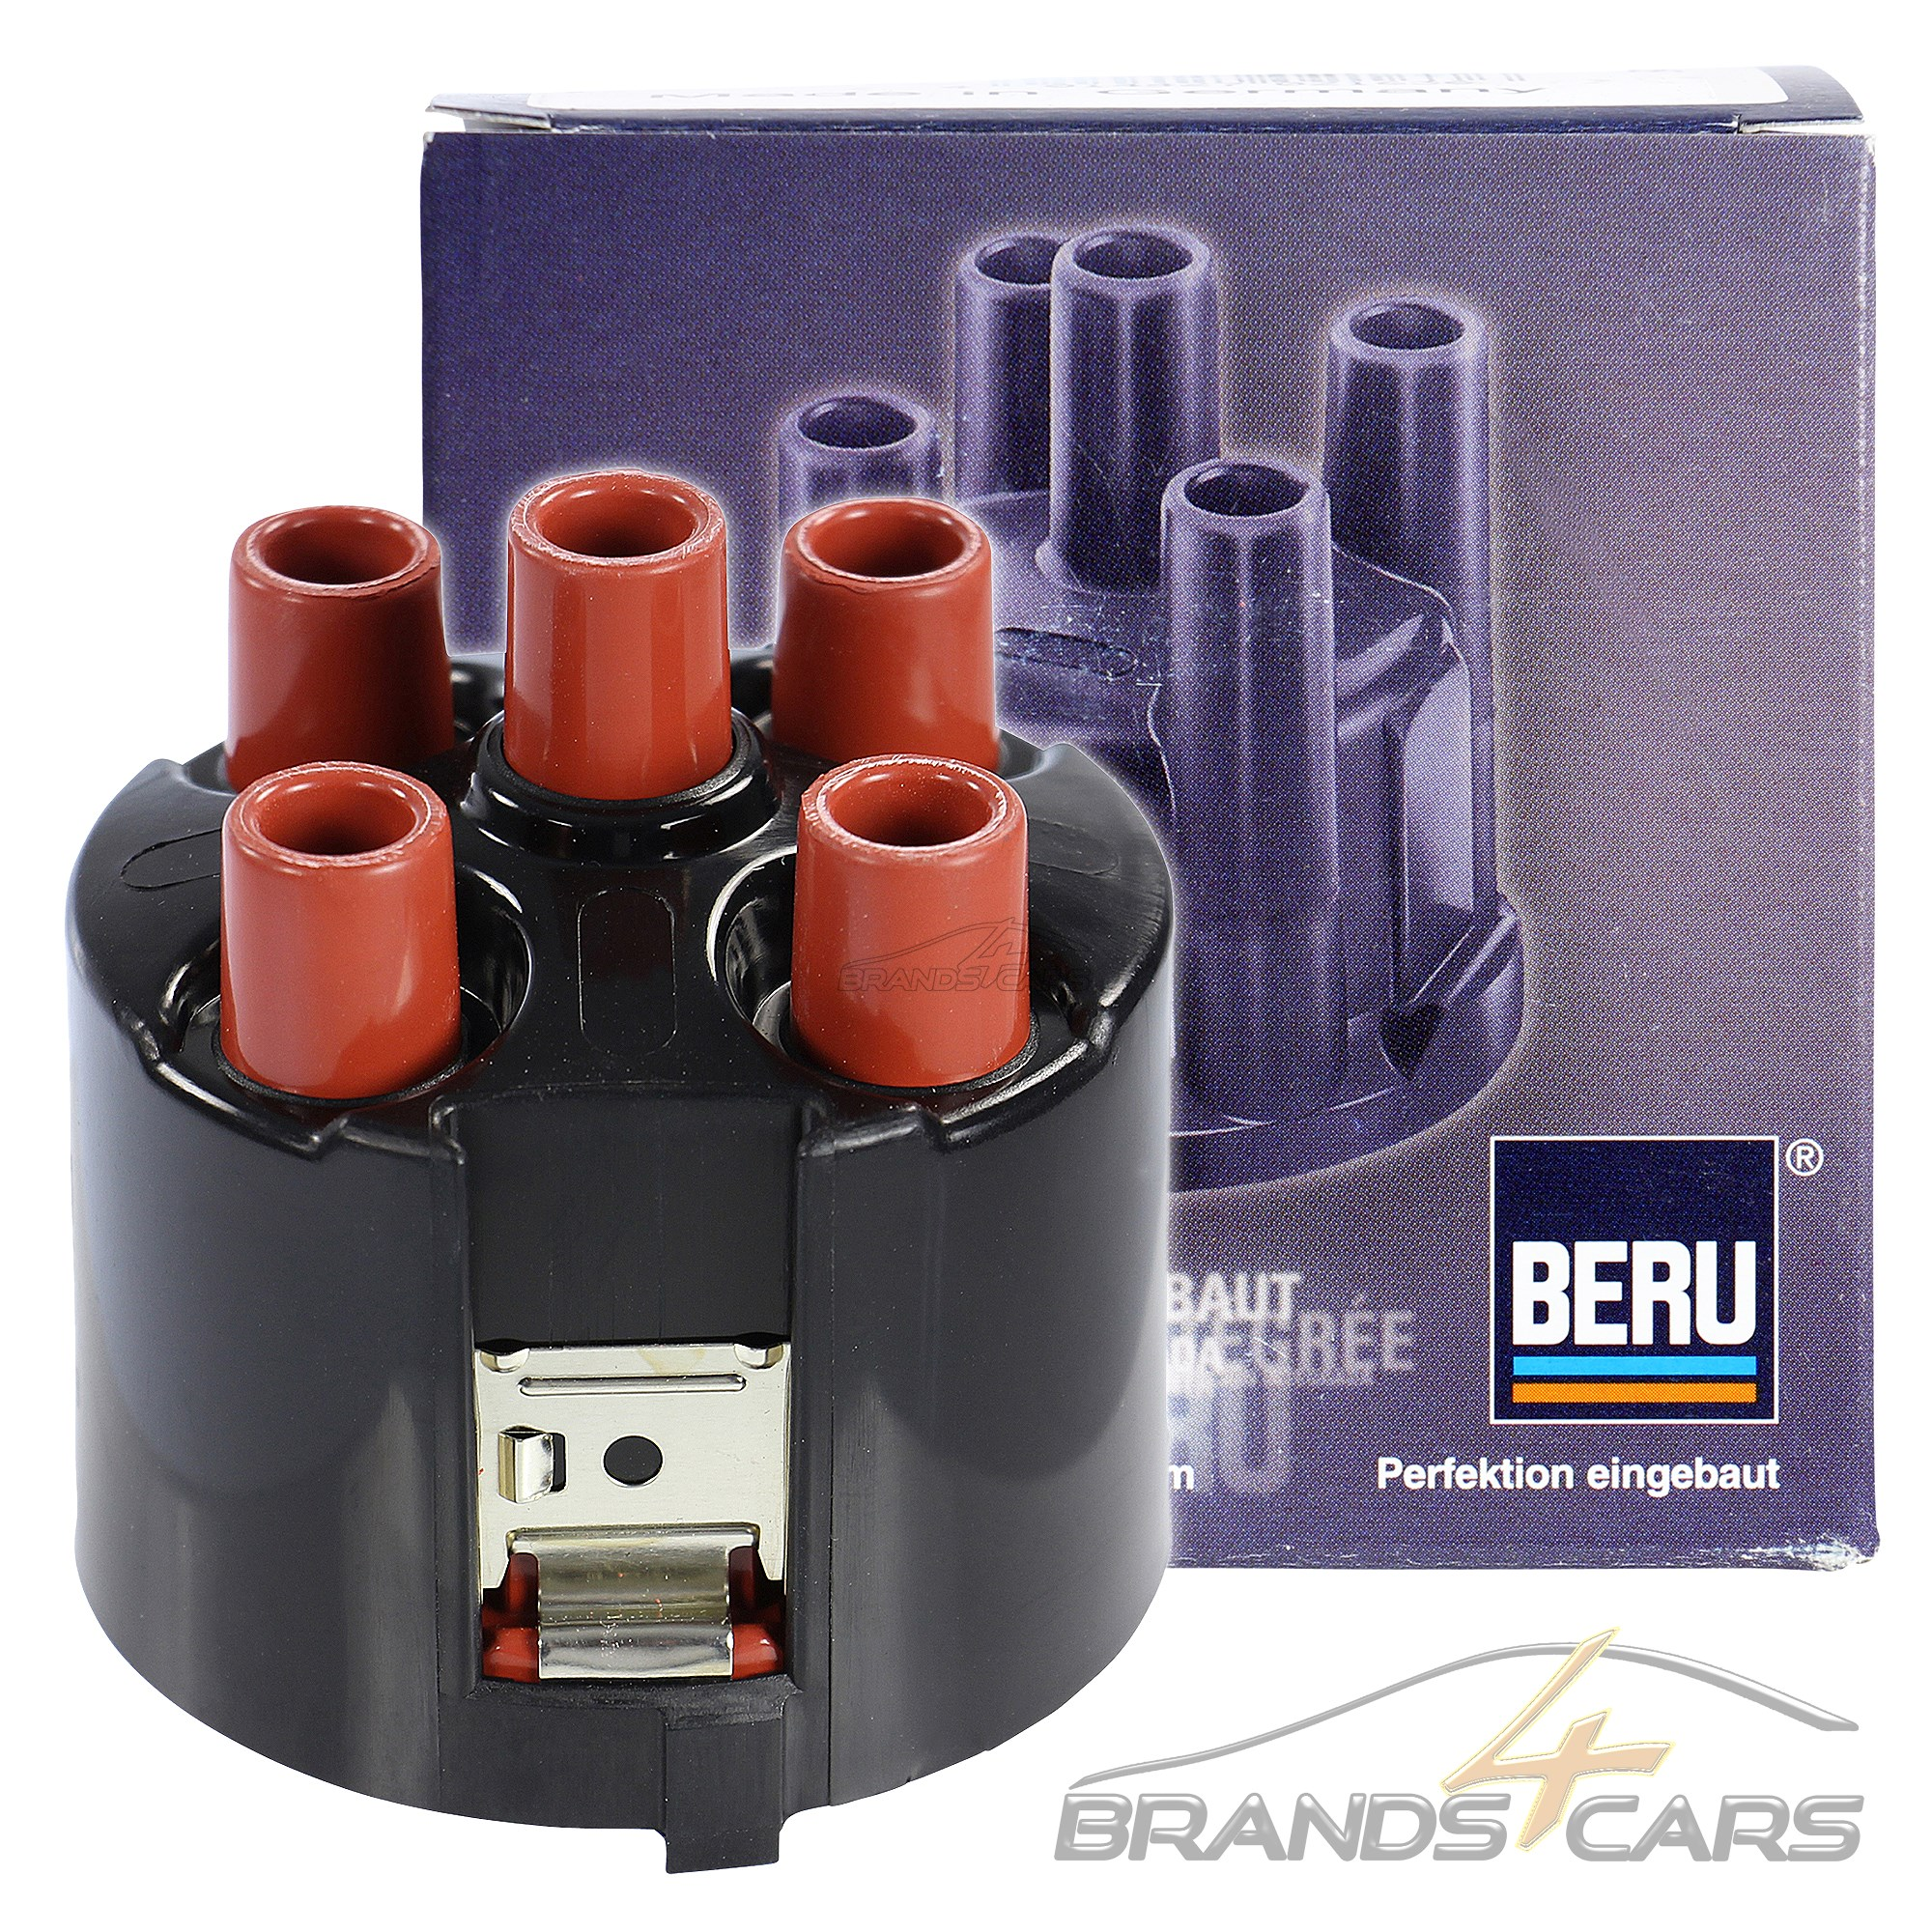 ORIGINALE Beru Tappo di Distribuzione dito di distribuzione VW TRANSPORTER BUS t4 1.8